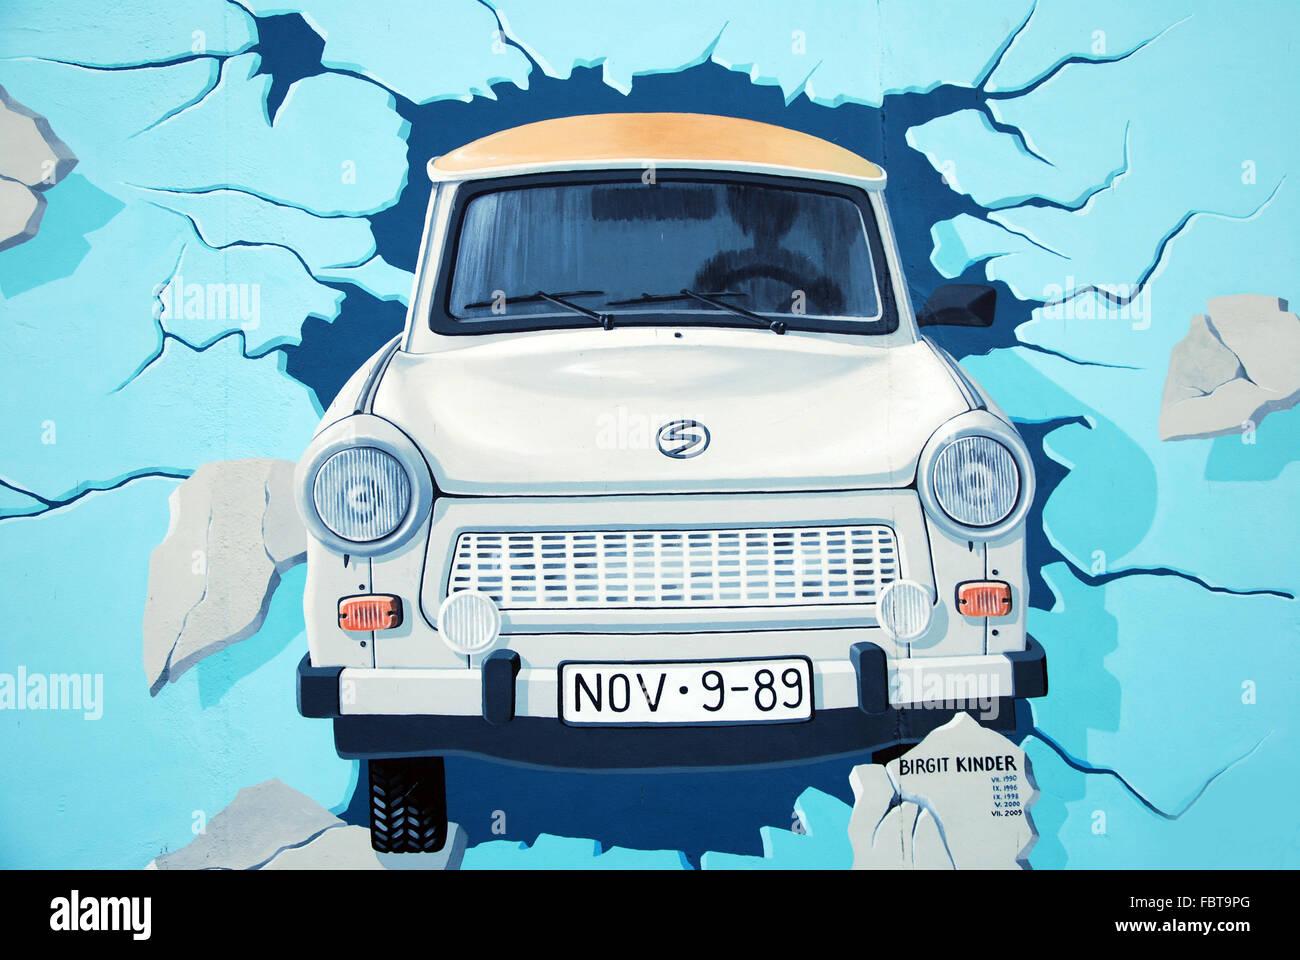 Berlin east side gallery trabant Photo Stock